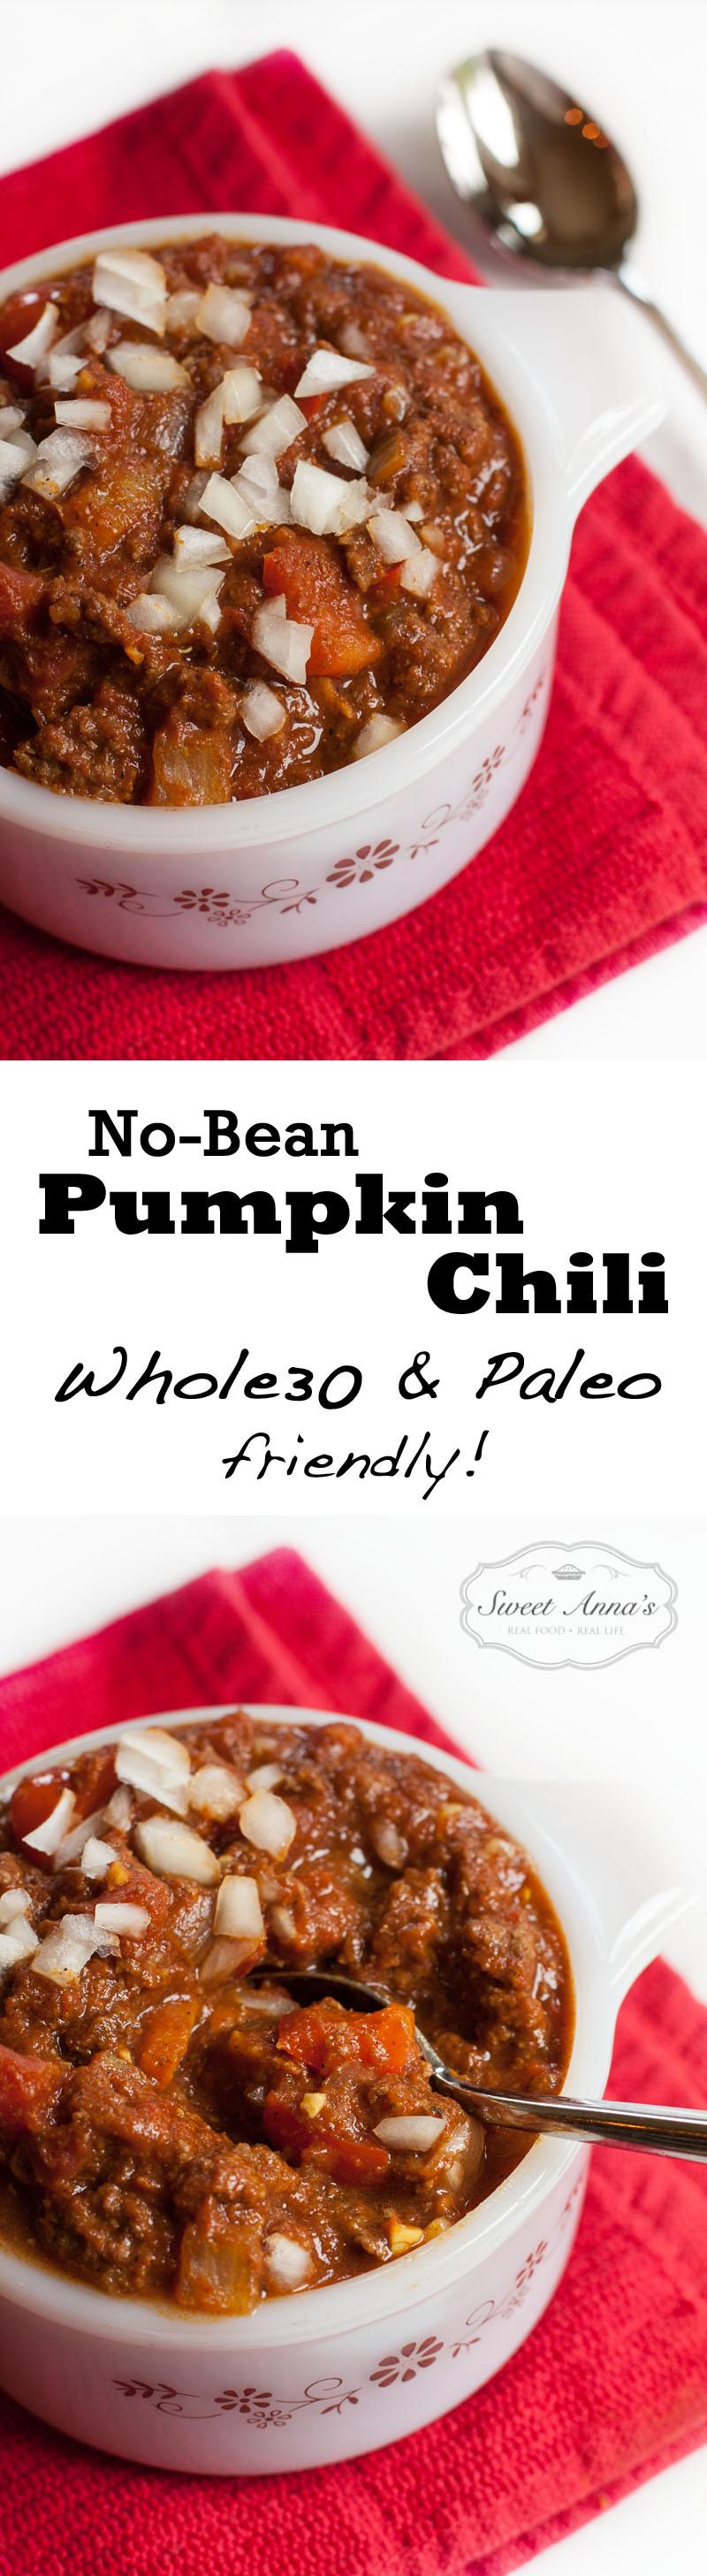 No-Bean Pumpkin Chili (Whole30 & Paleo friendly!) | Sweet Anna's